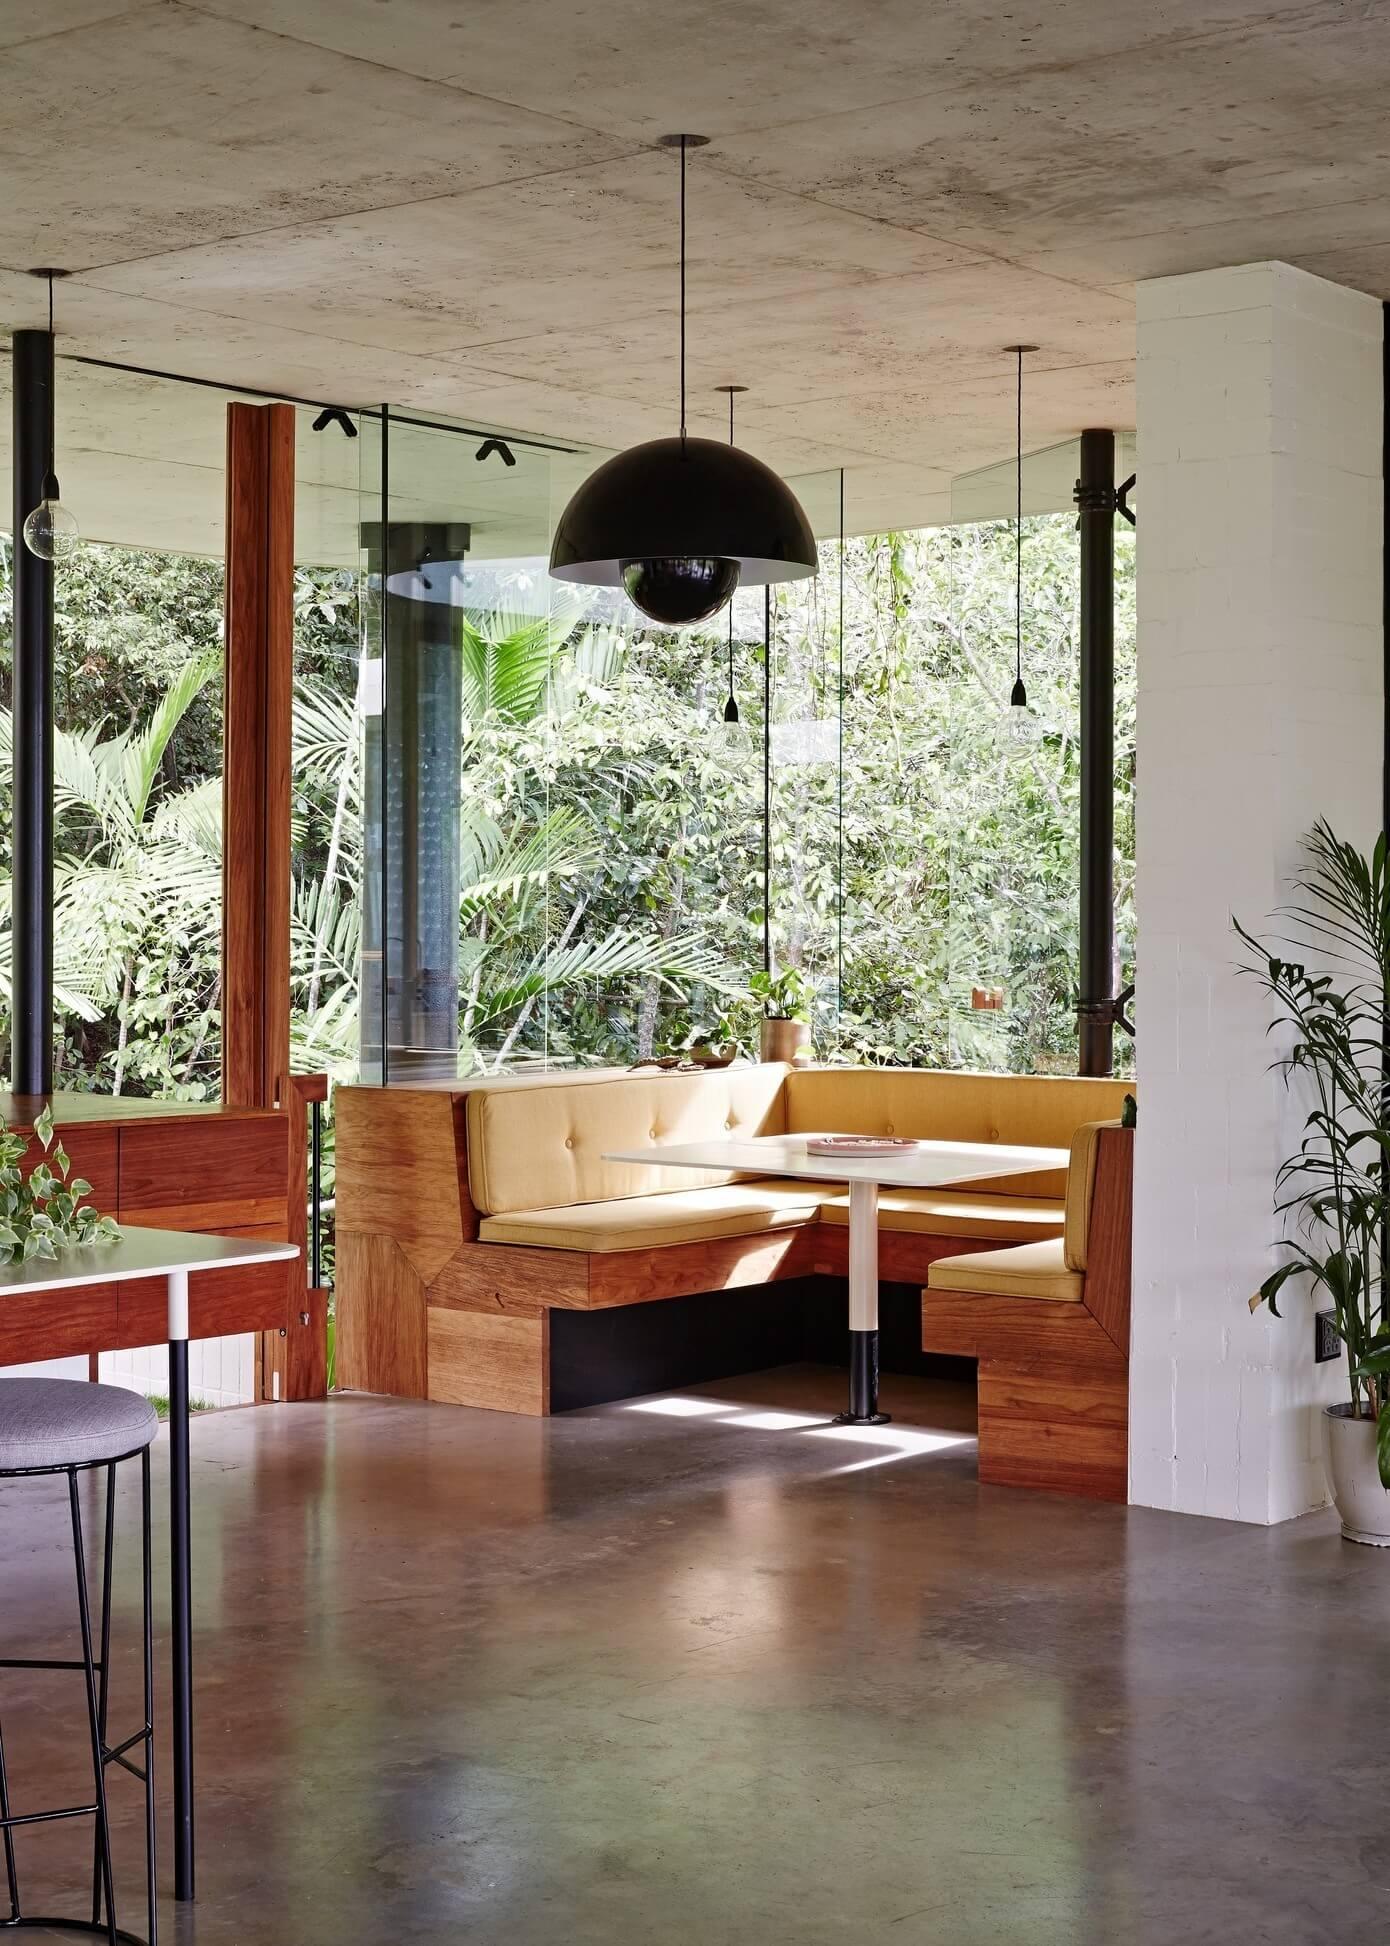 planchonella-house-jesse-bennett-architect-05